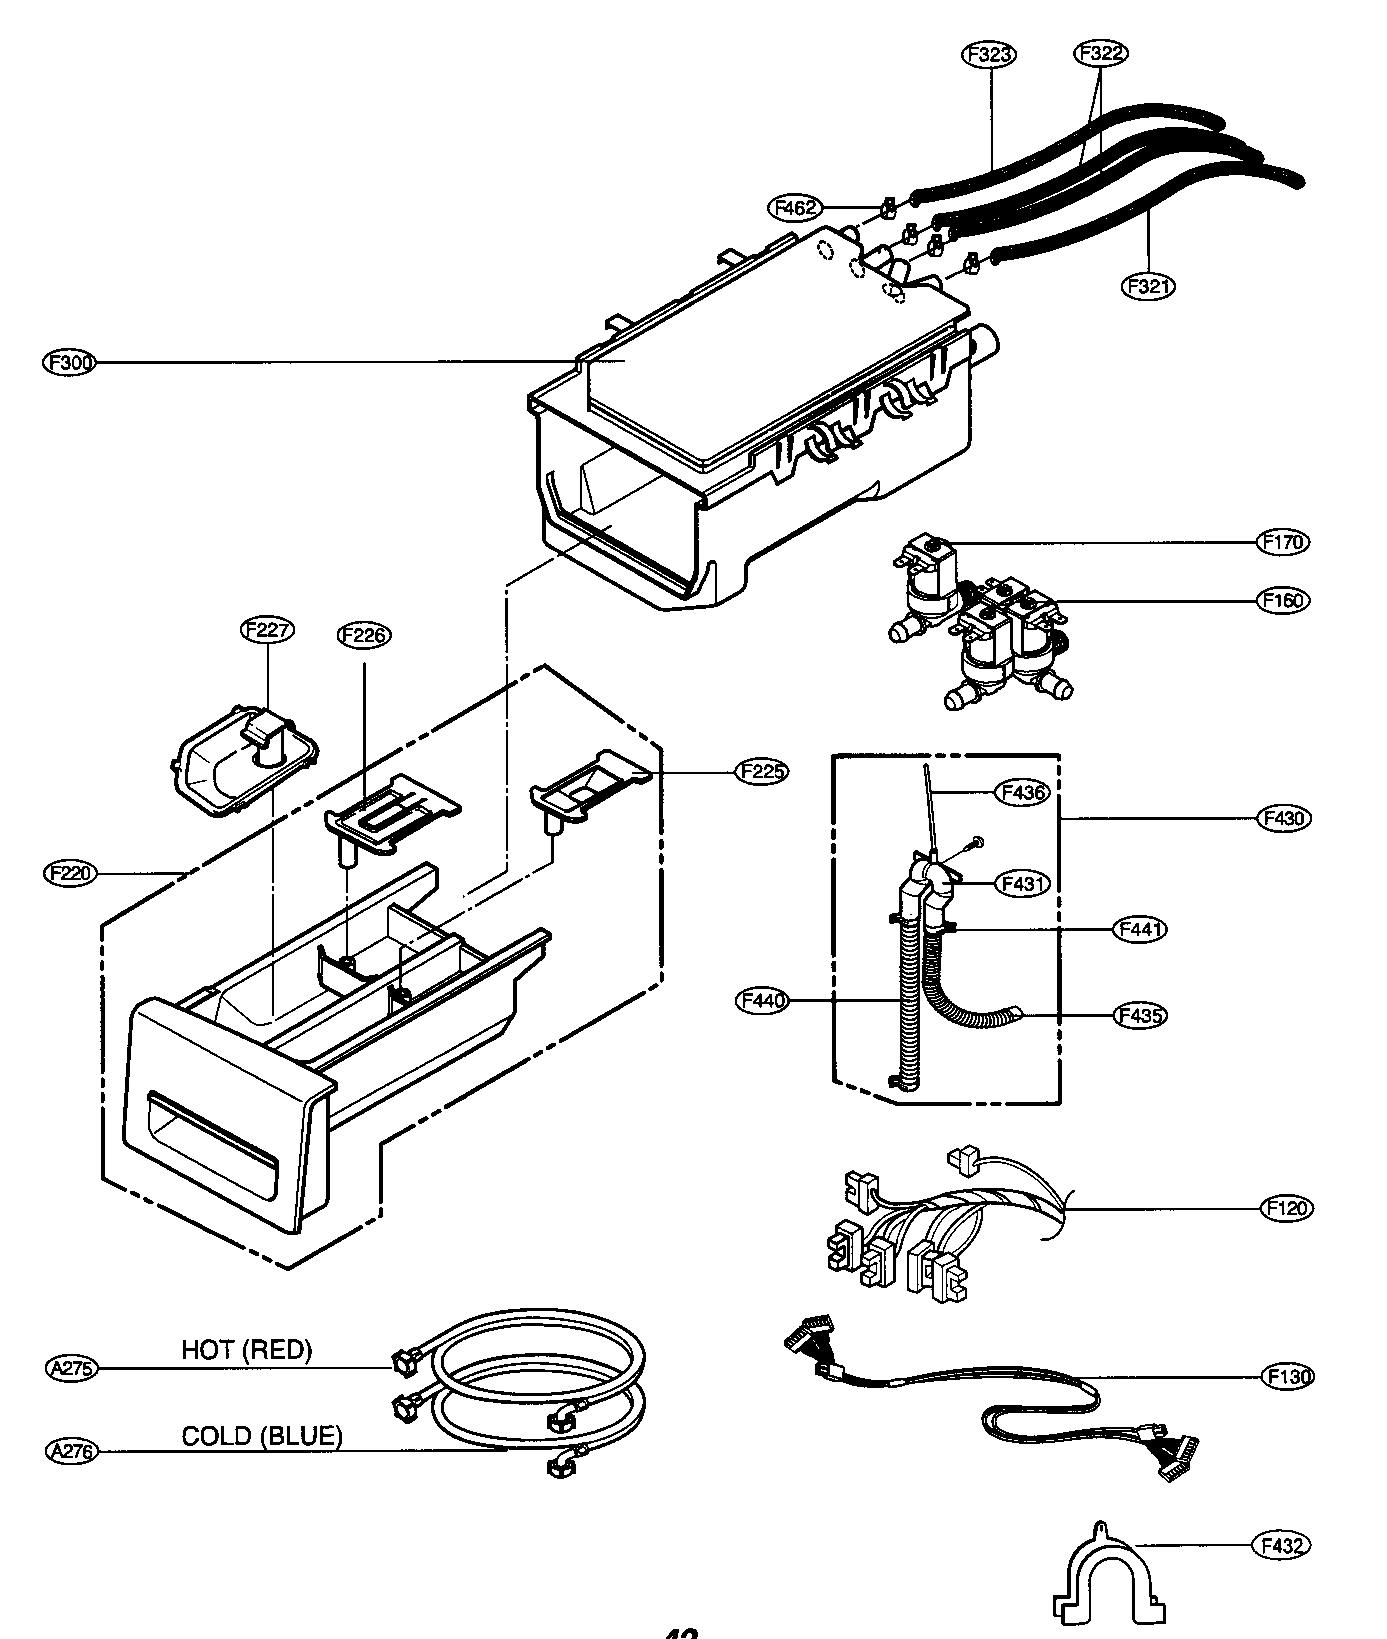 Lg model WM3677HW residential washers genuine parts